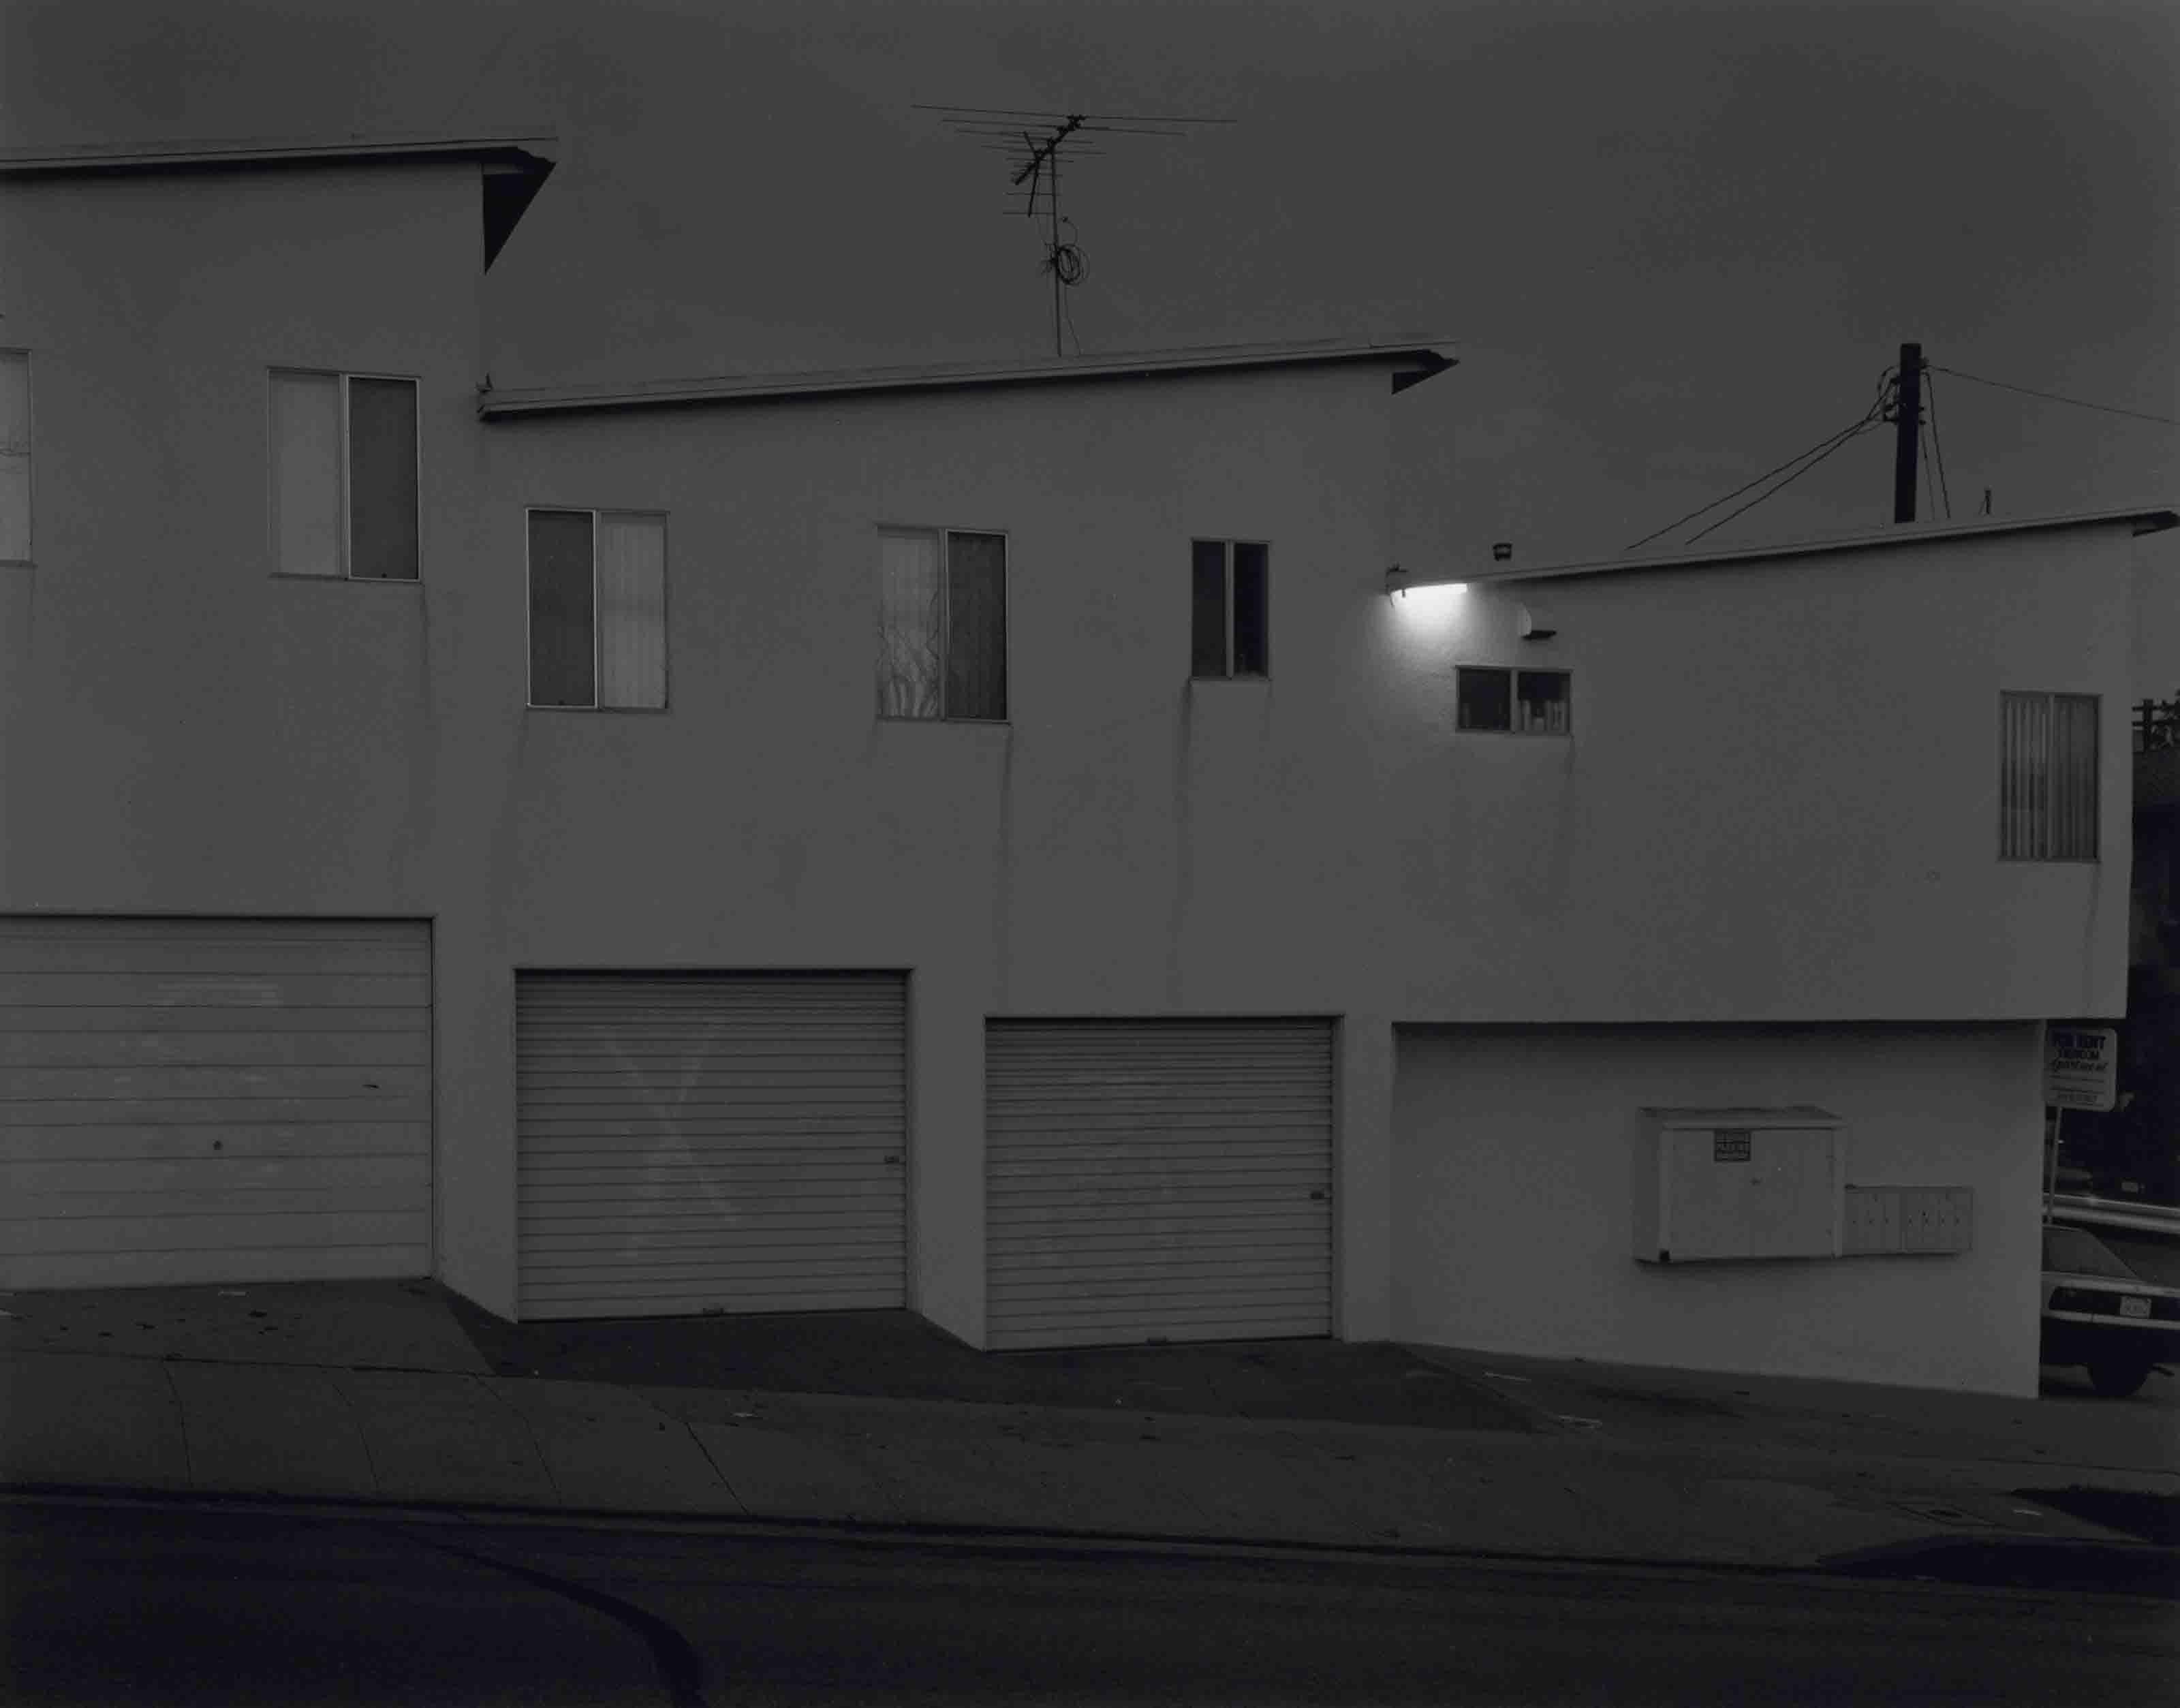 Apartments, West Los Angeles, 2003